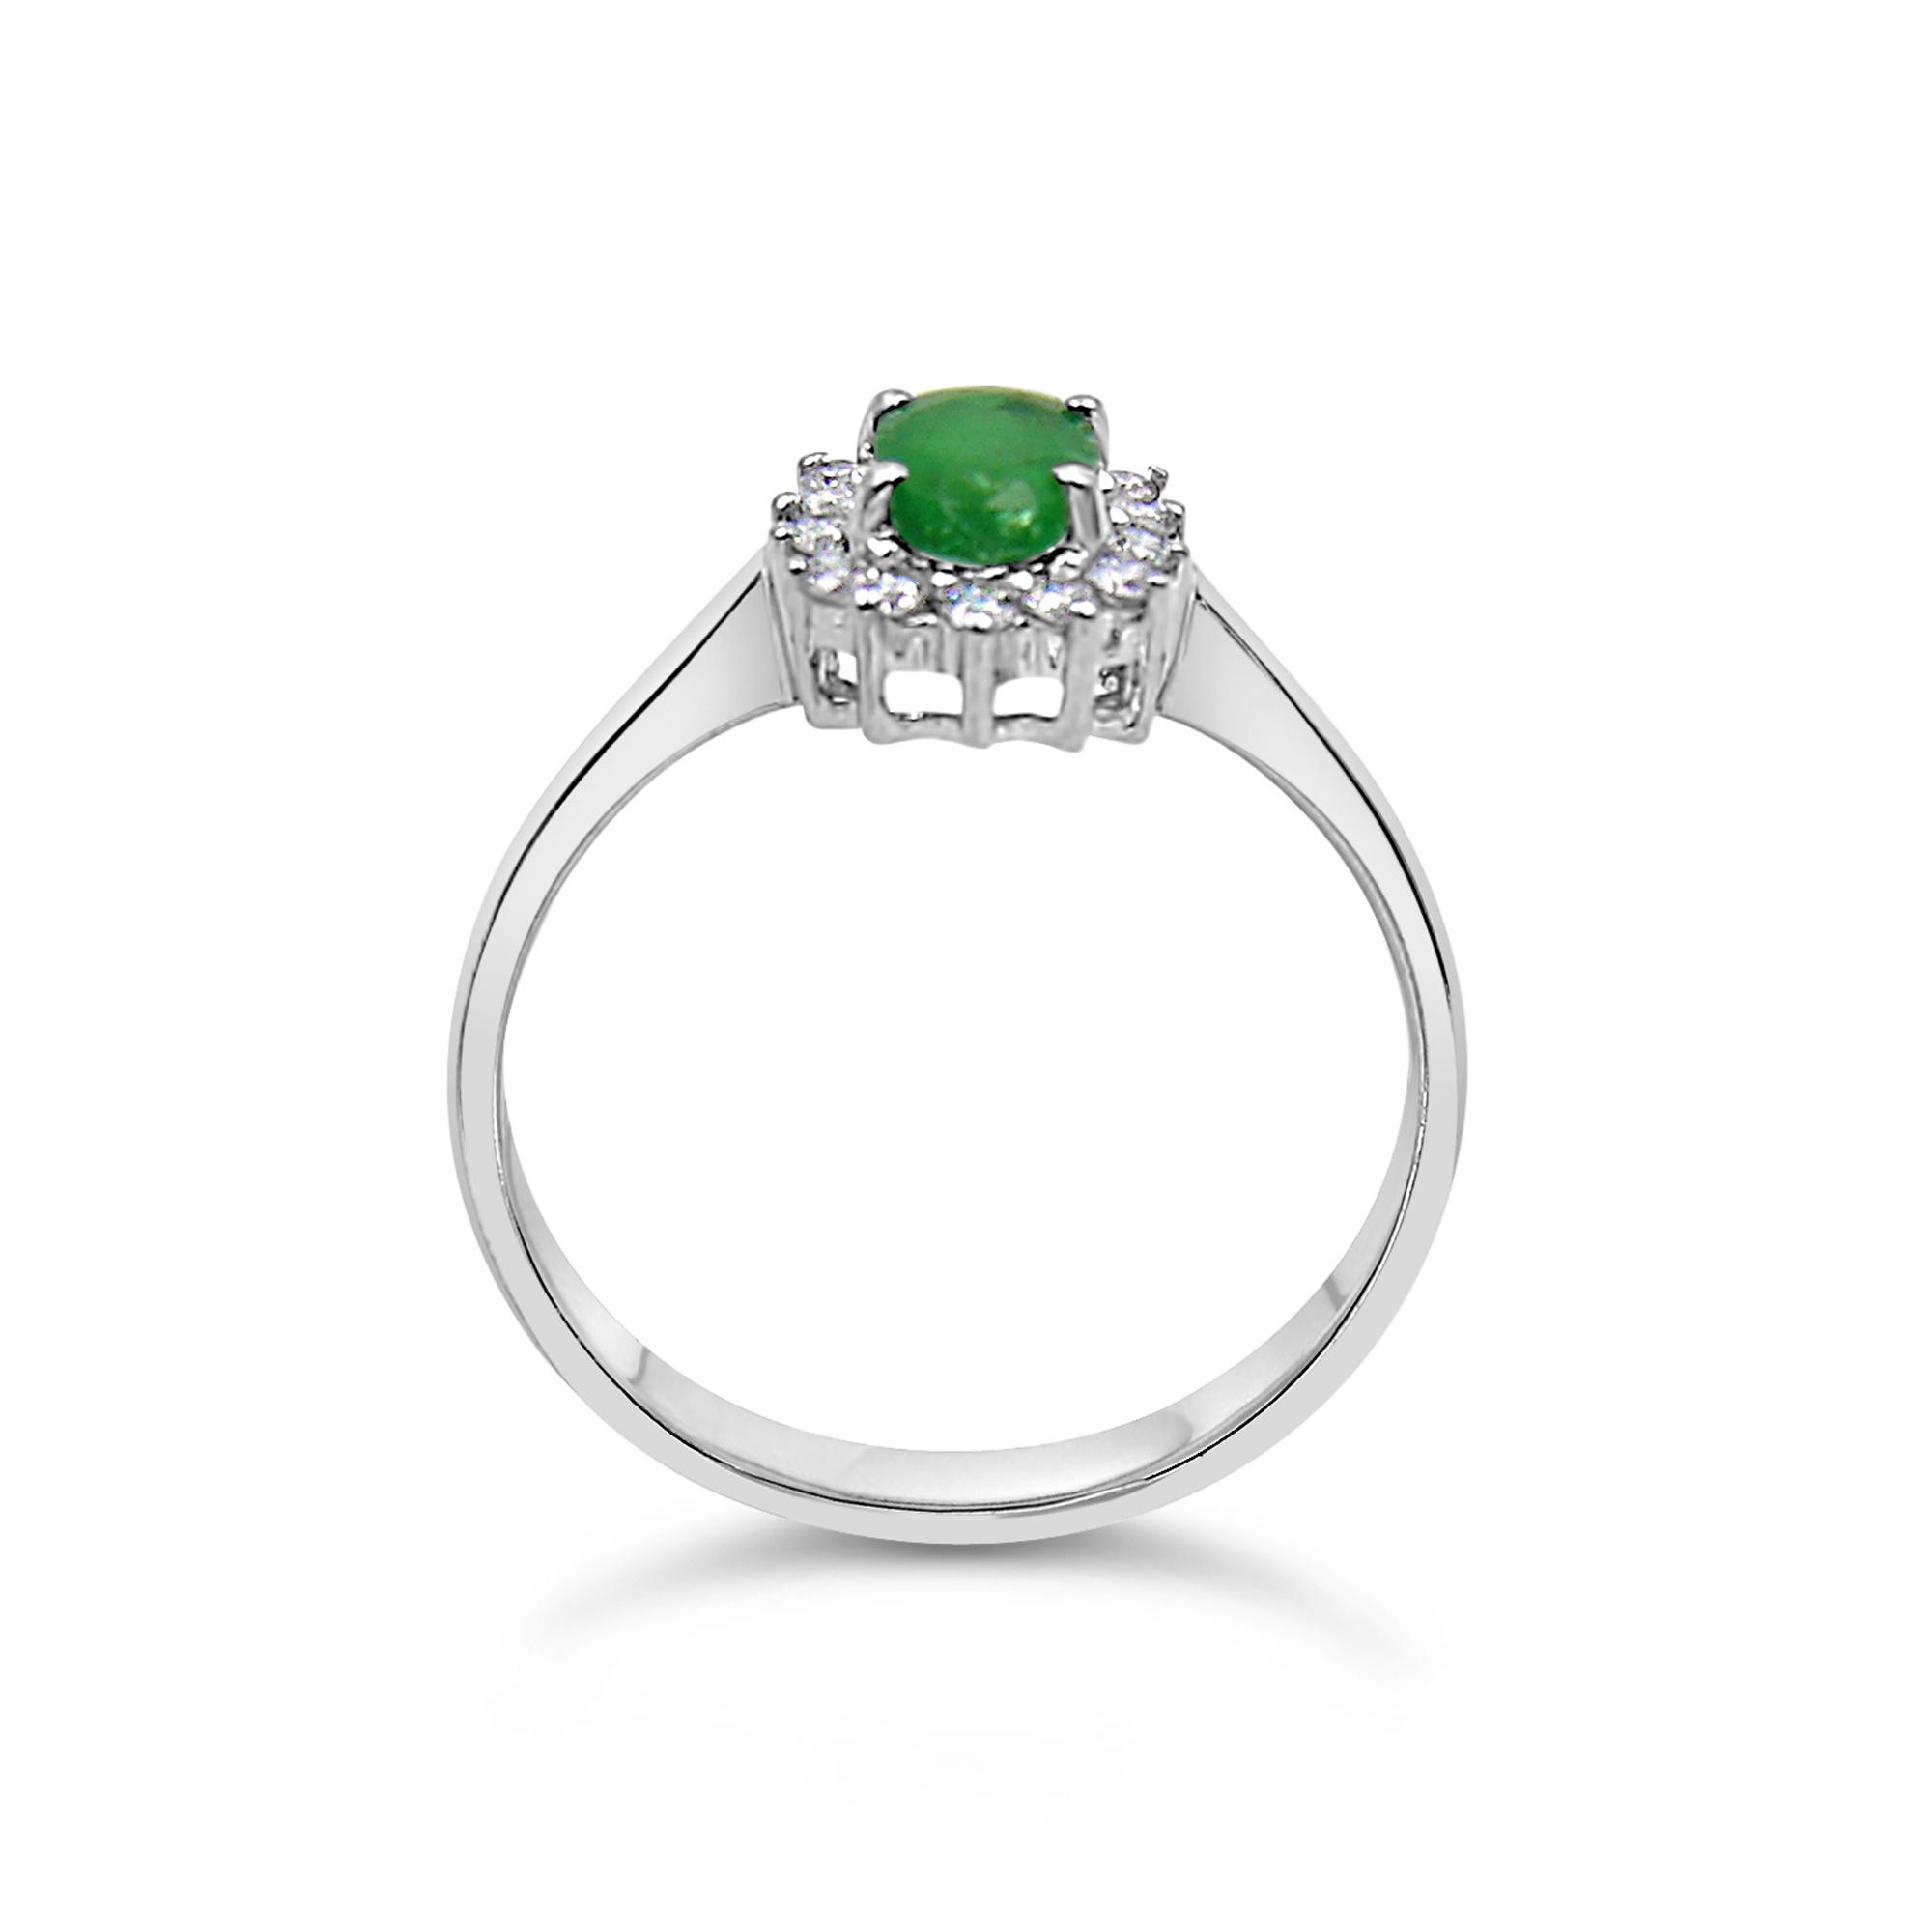 18 karat white gold ring with 0.20 ct diamonds  & 0.50 ct emerald